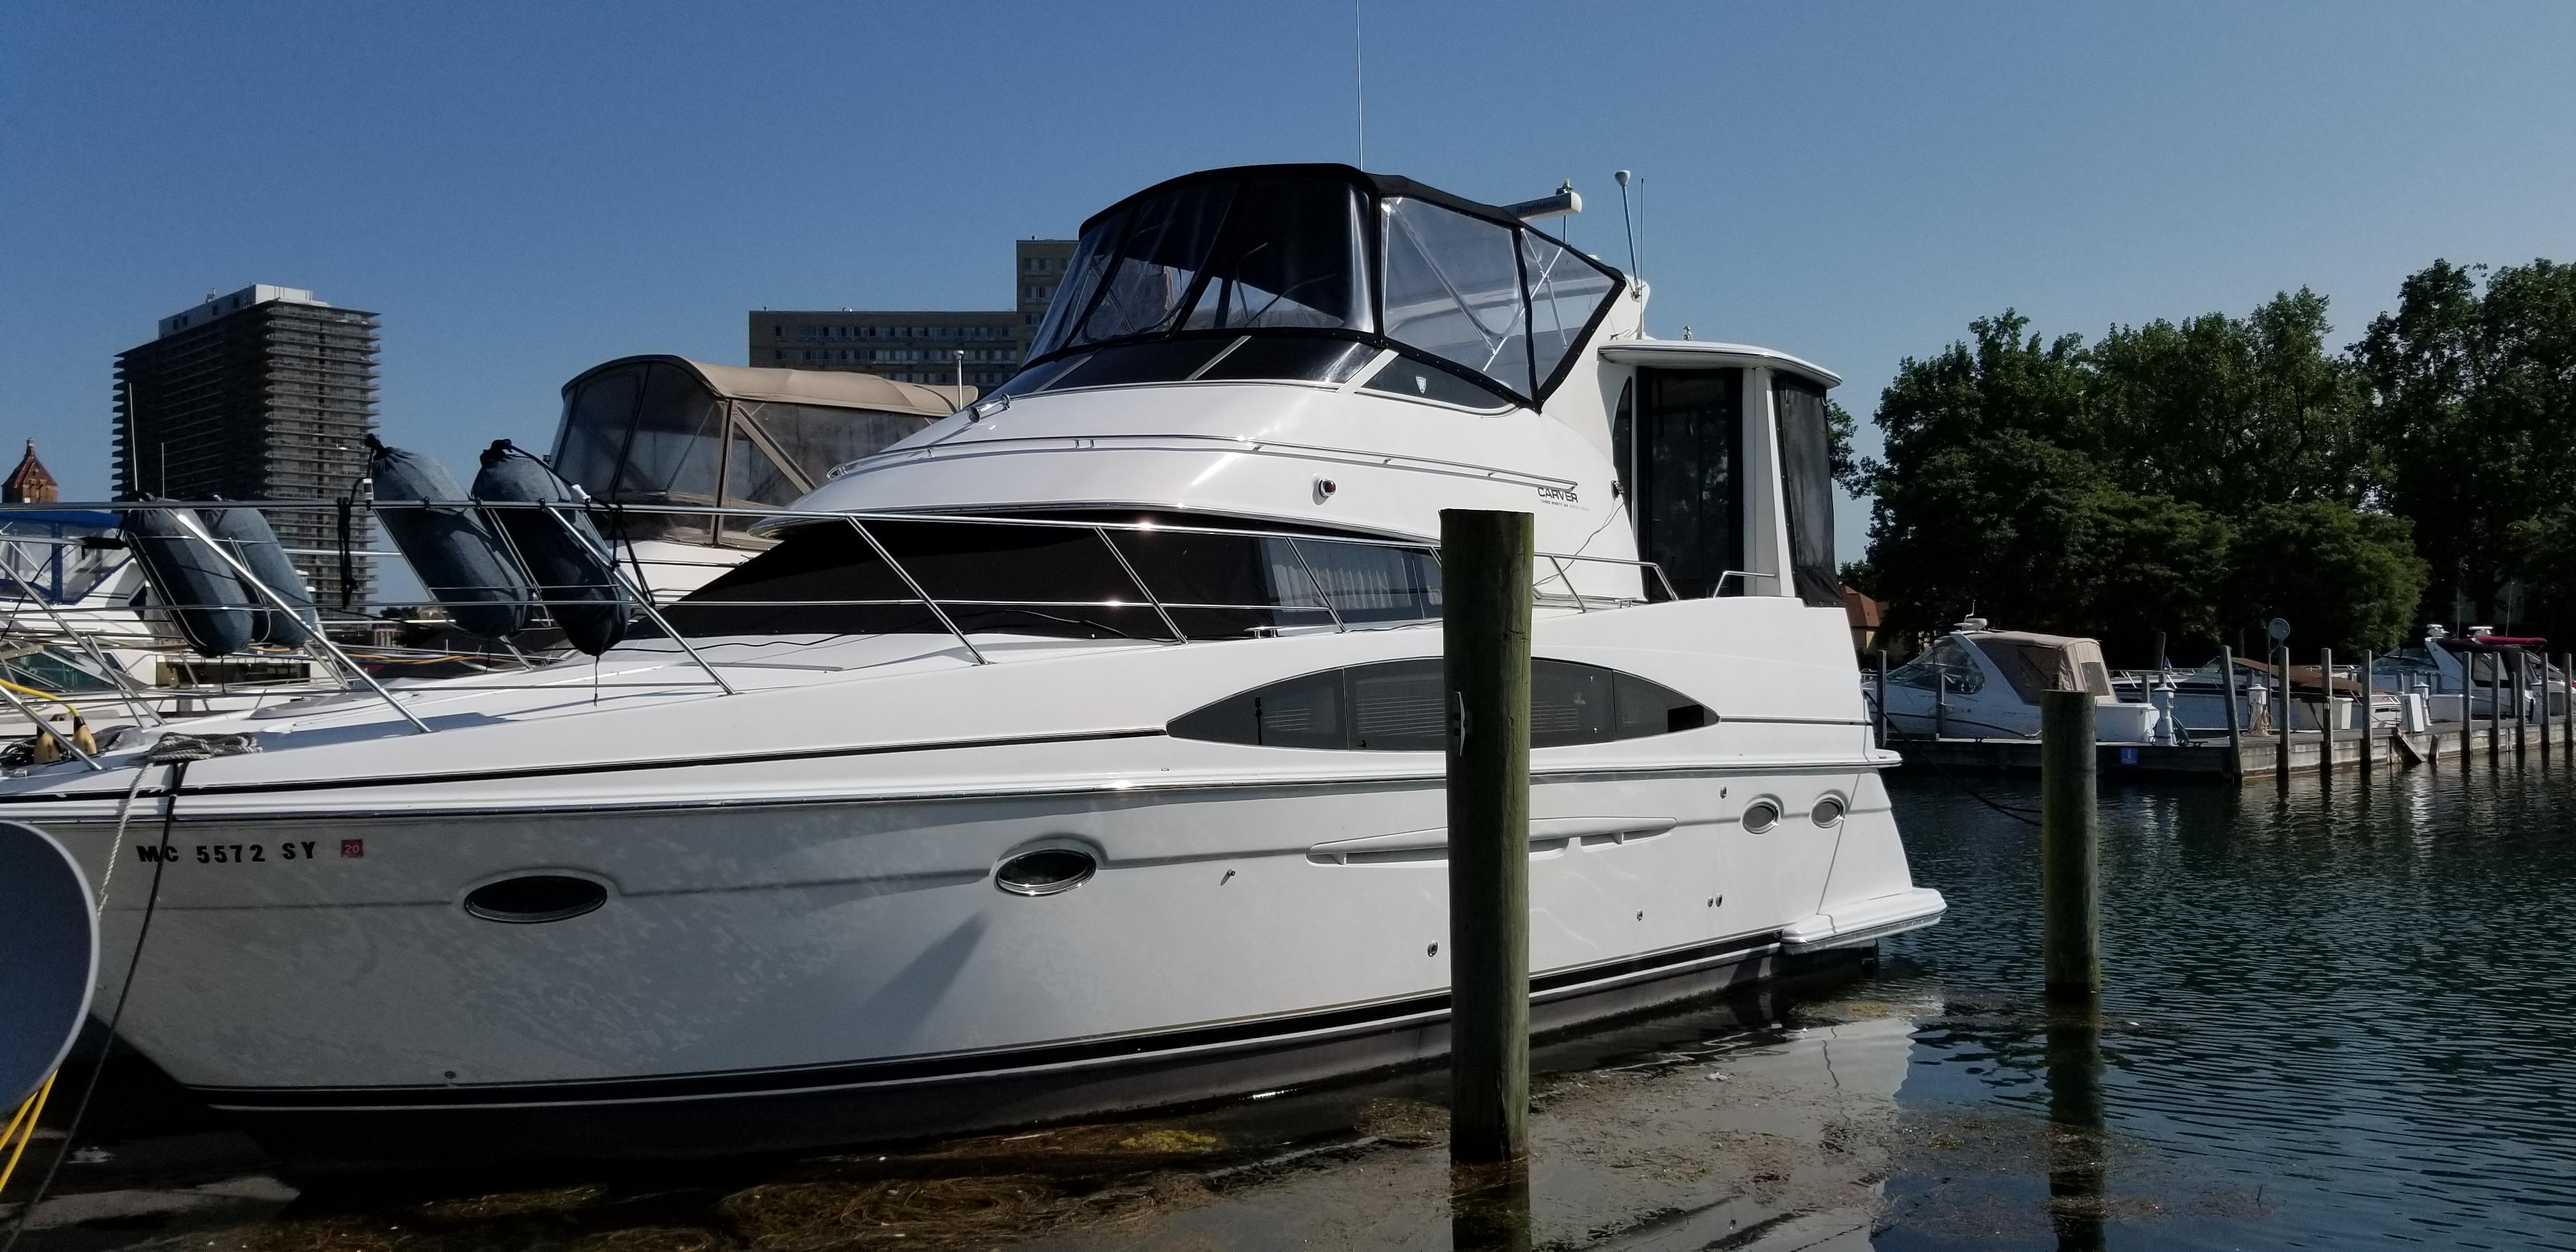 Carver 396 Motor Yacht 2000 Carver 396 Motor Yacht